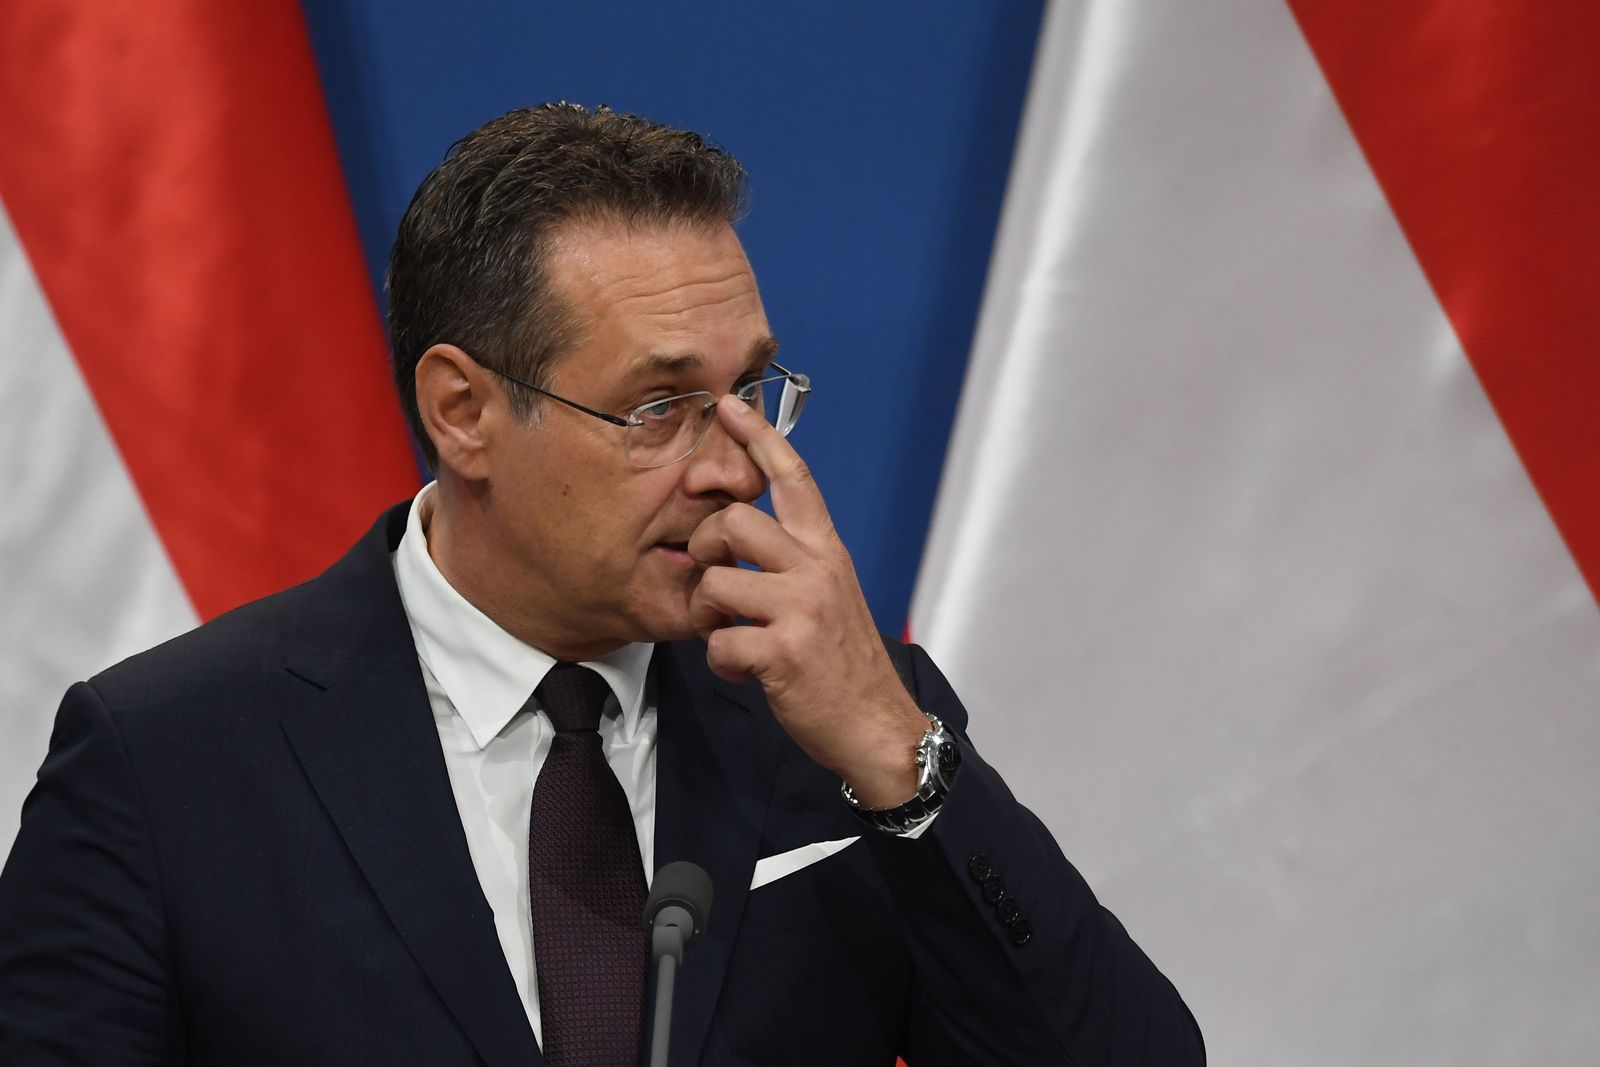 HUNGARY-AUSTRIA-DIPLOMACY